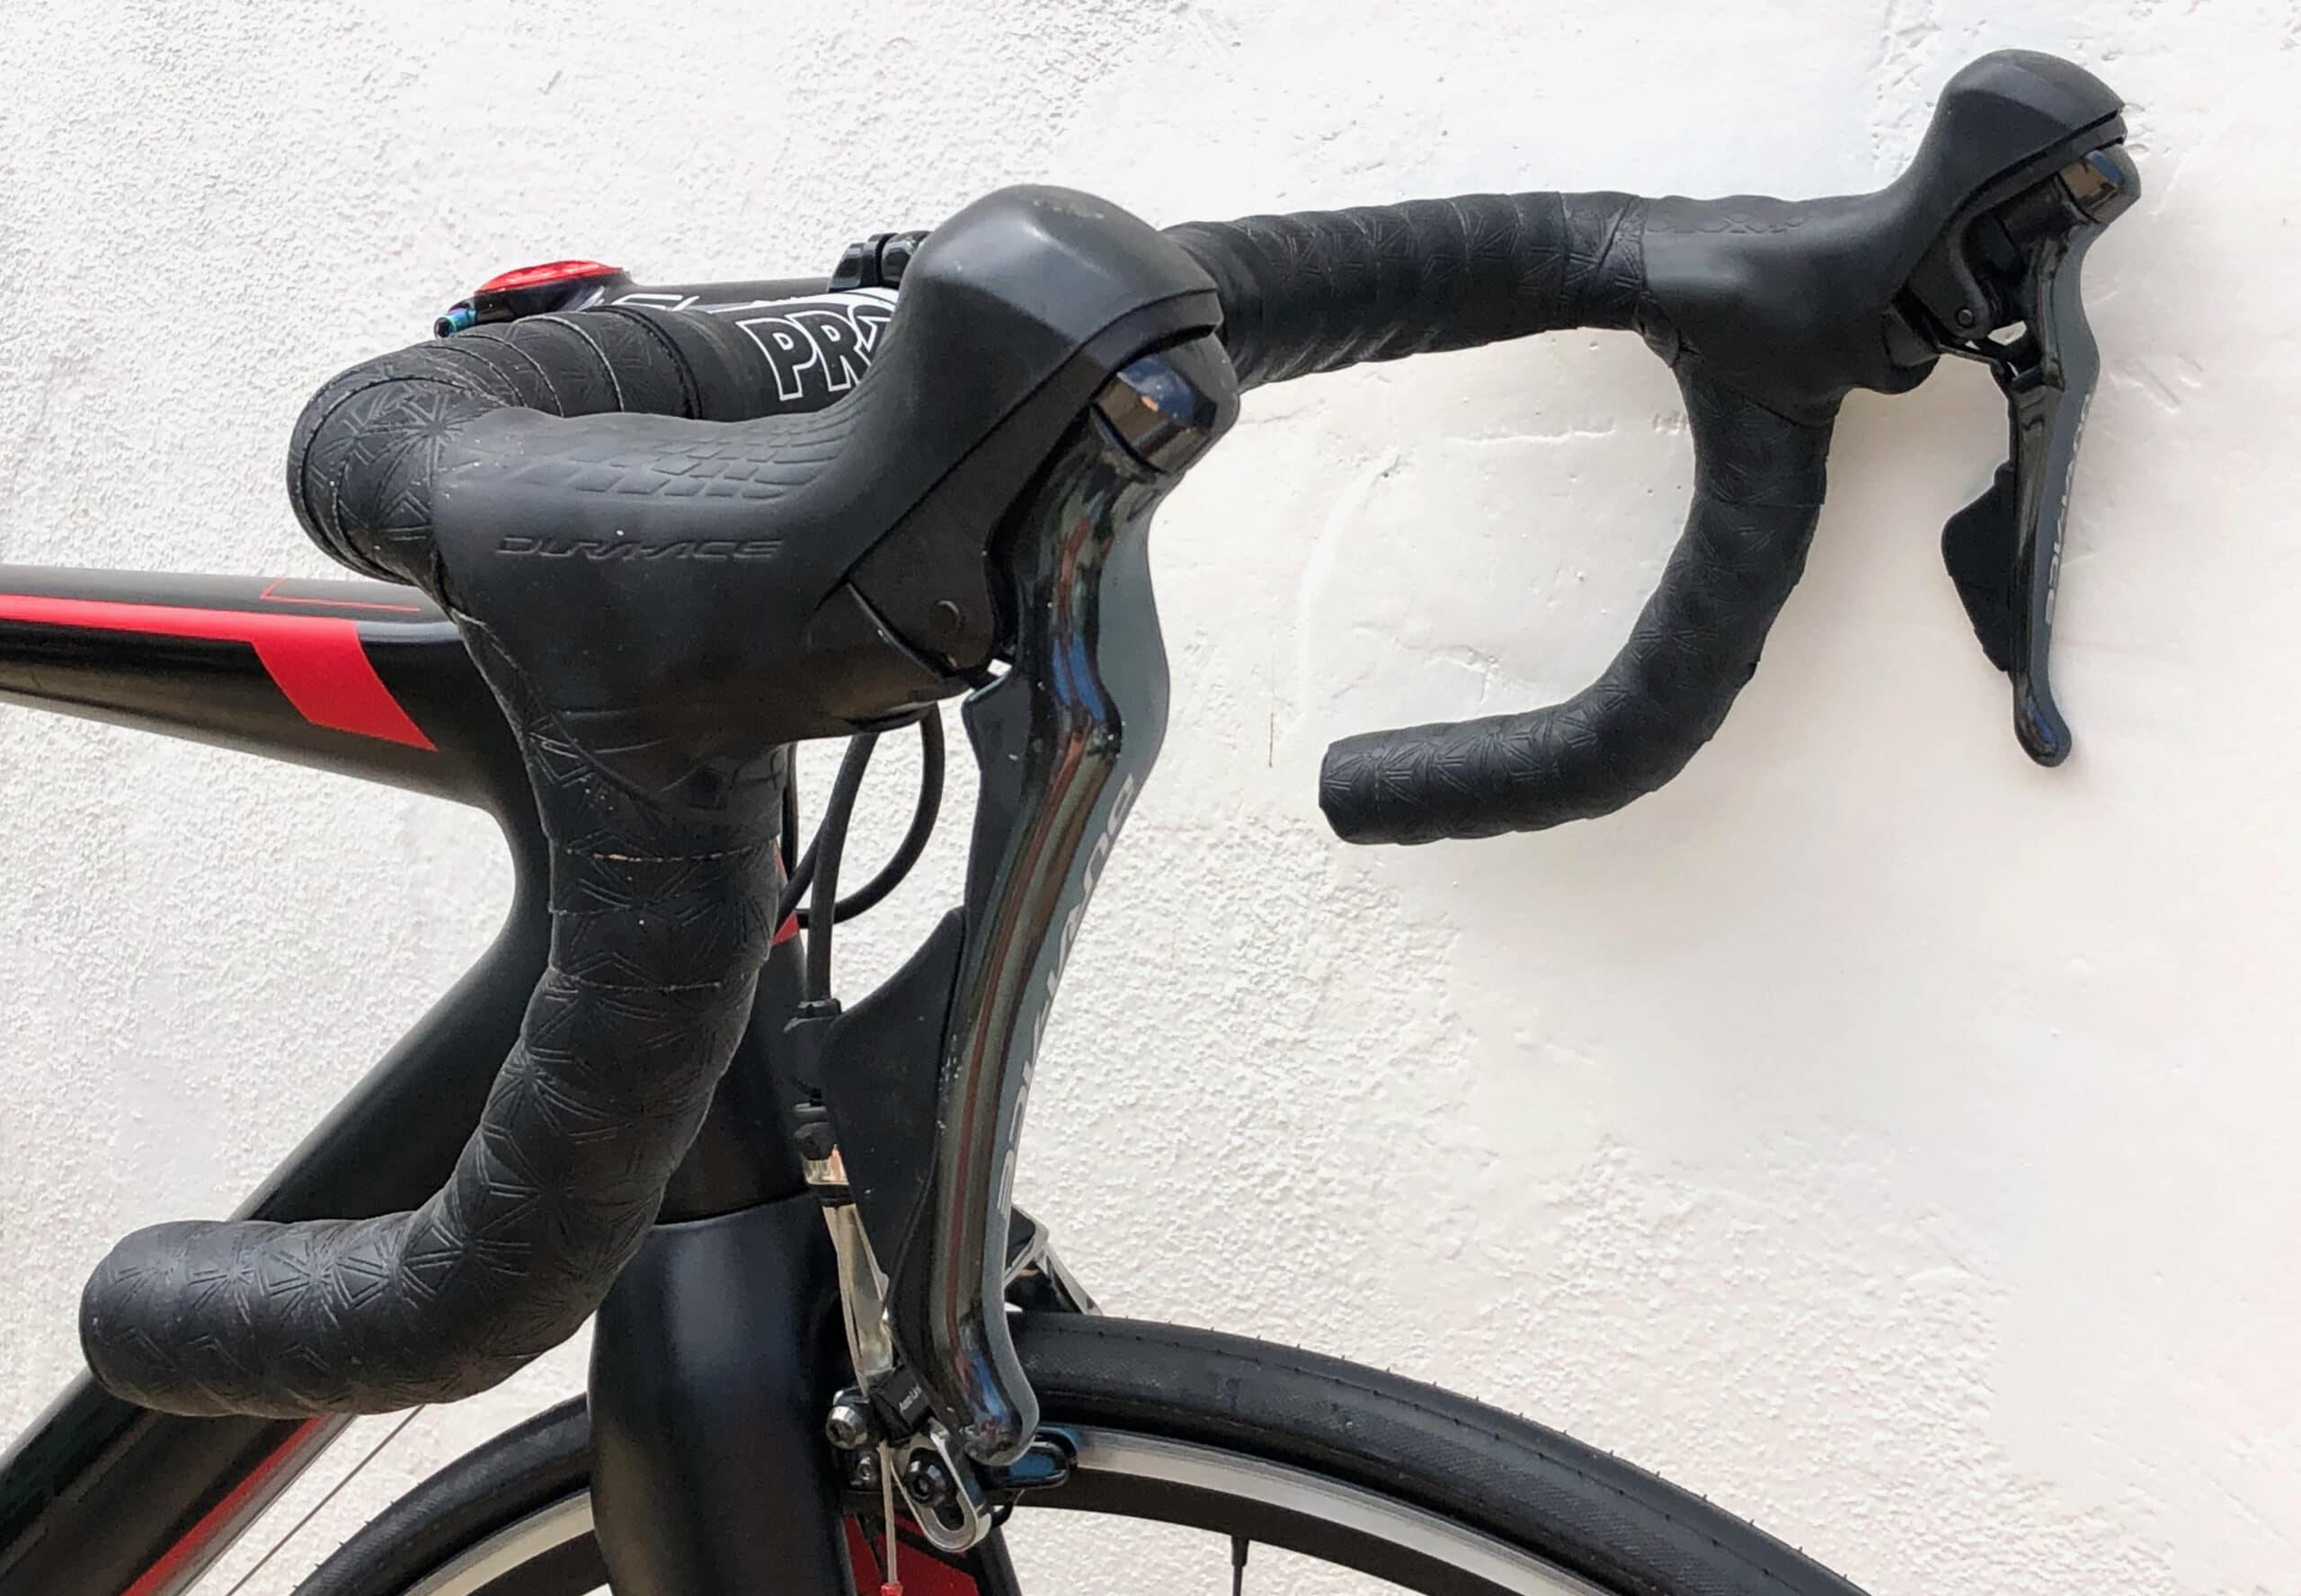 Fuji Altamira Limited Edition Full Carbon Road Bike Dura Ace 9100 Sram Red - M